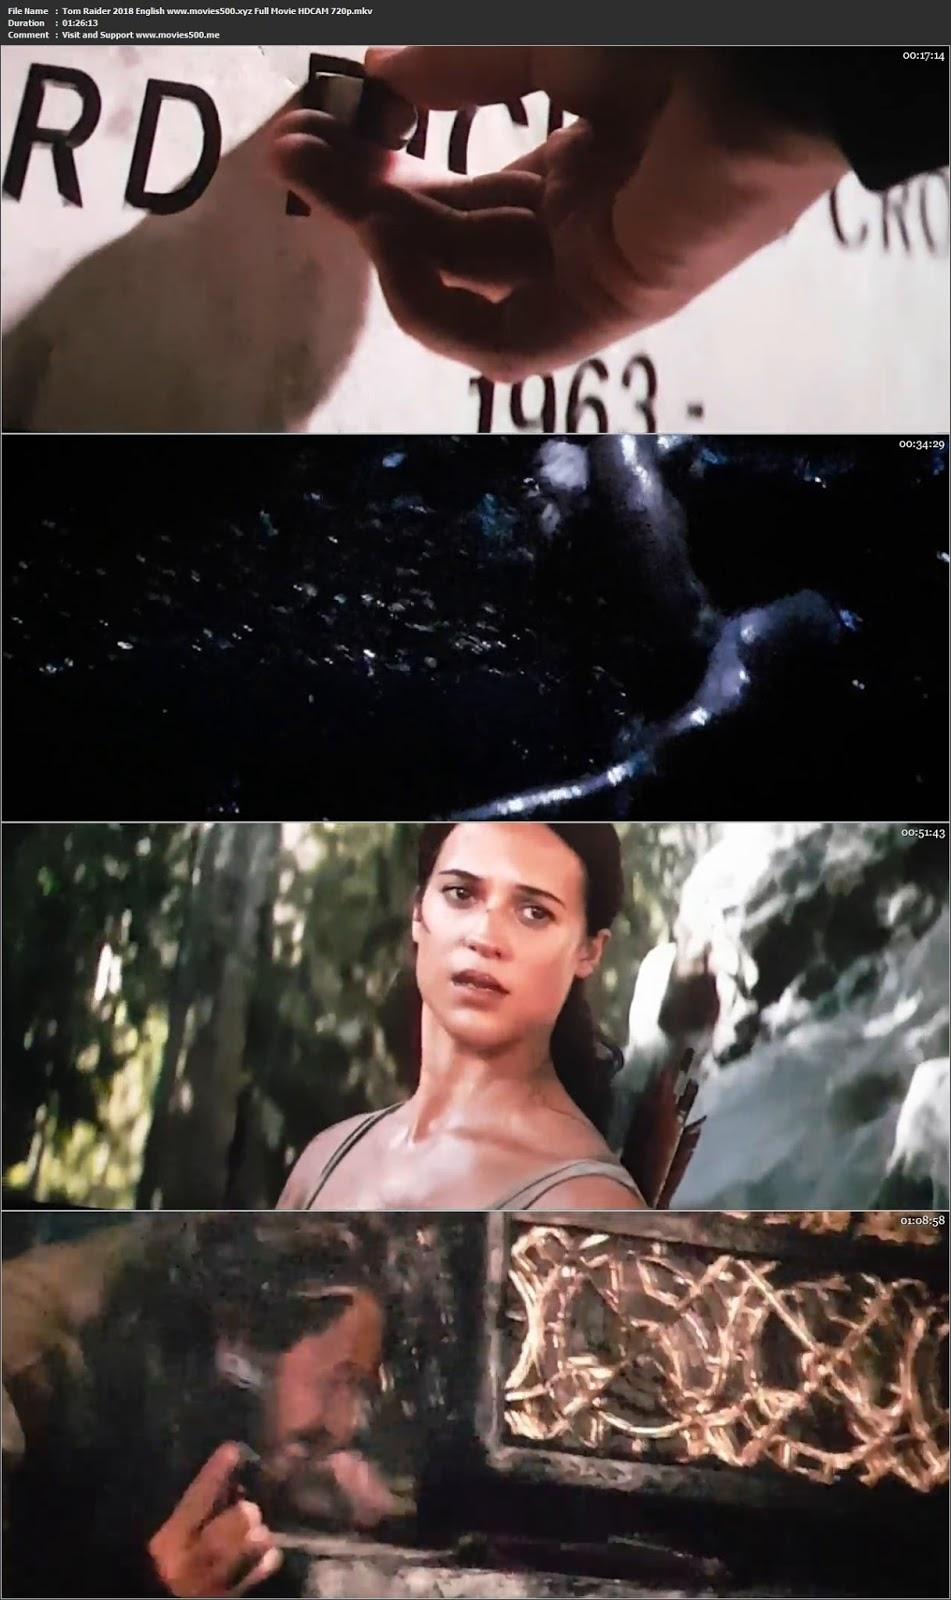 Tomb Raider 2018 English Full Movie HDCAM 720p at movies500.site